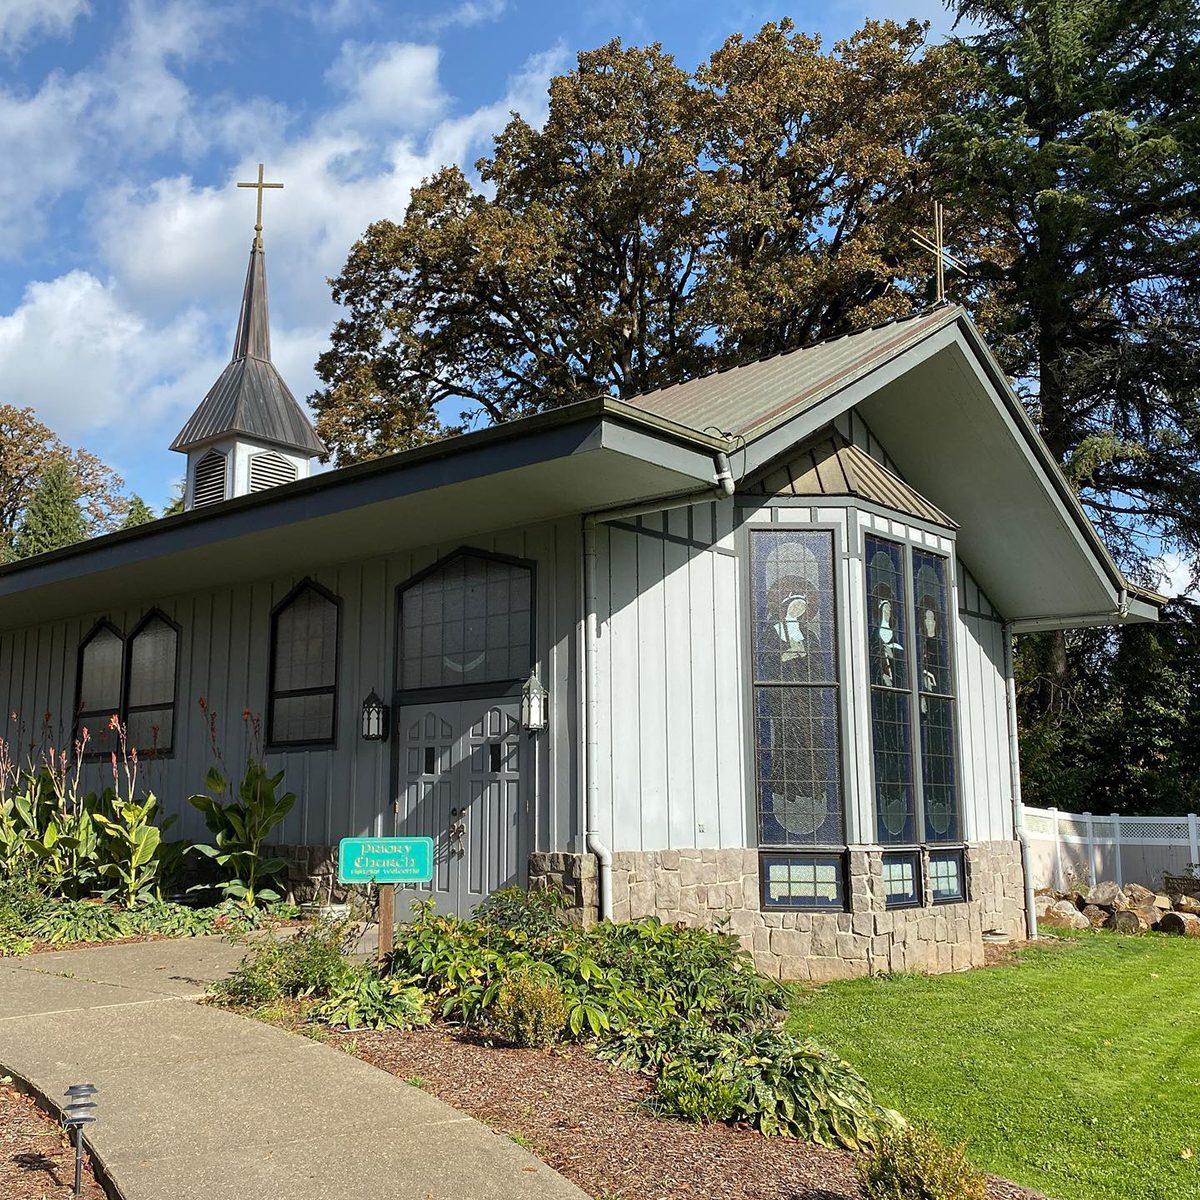 The Best Fudge Shop in Oregon - The Brigittine Monastery